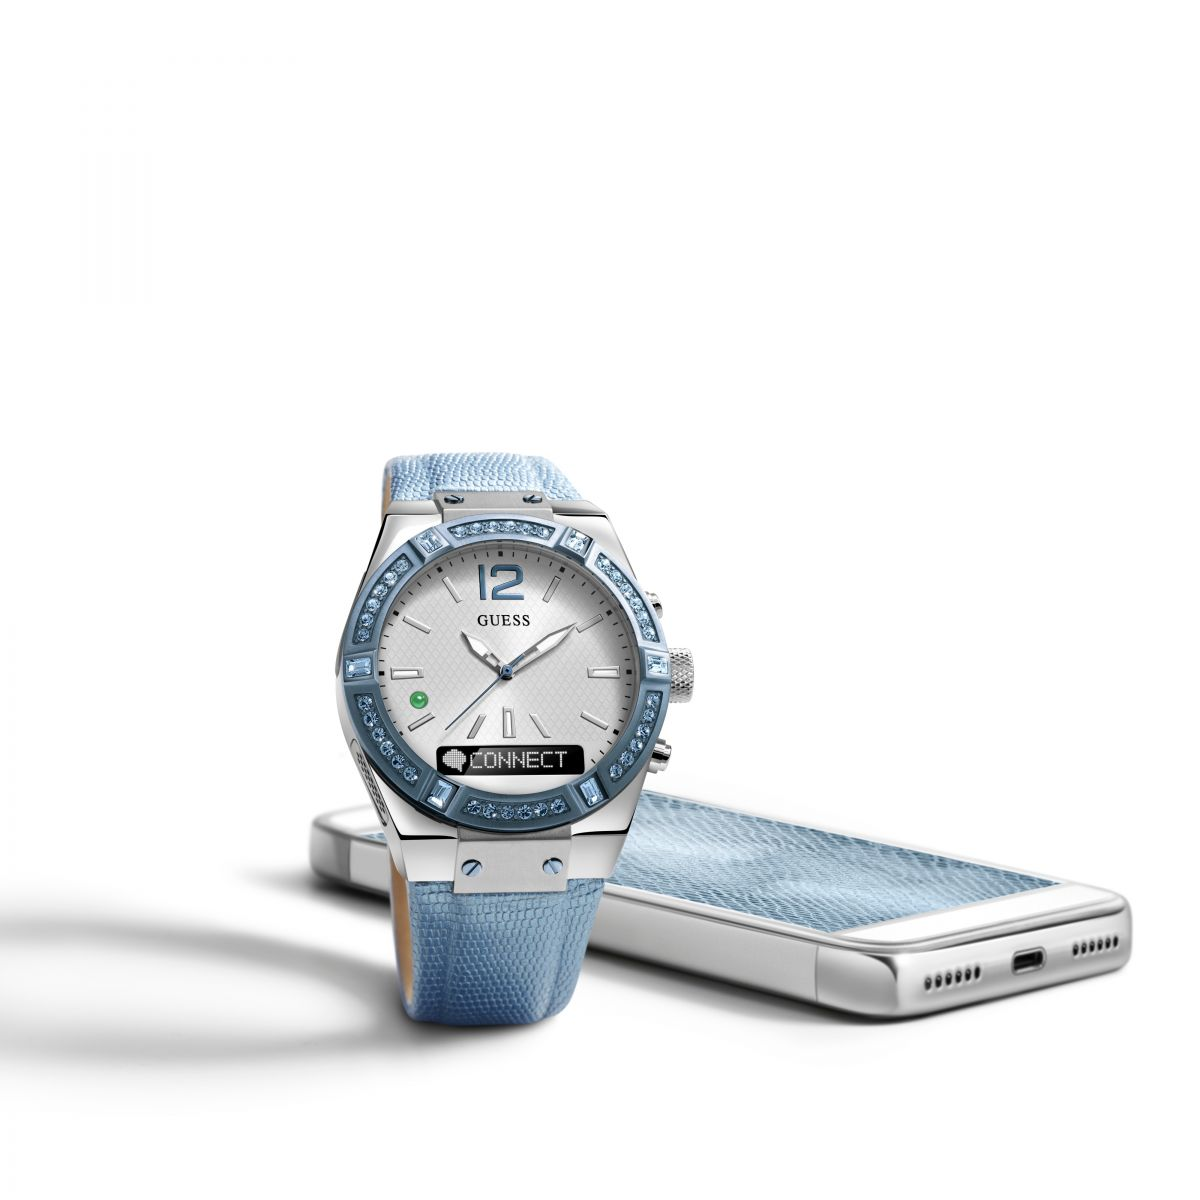 femme guess connect bluetooth hybride smartwatch montre c0002m5. Black Bedroom Furniture Sets. Home Design Ideas